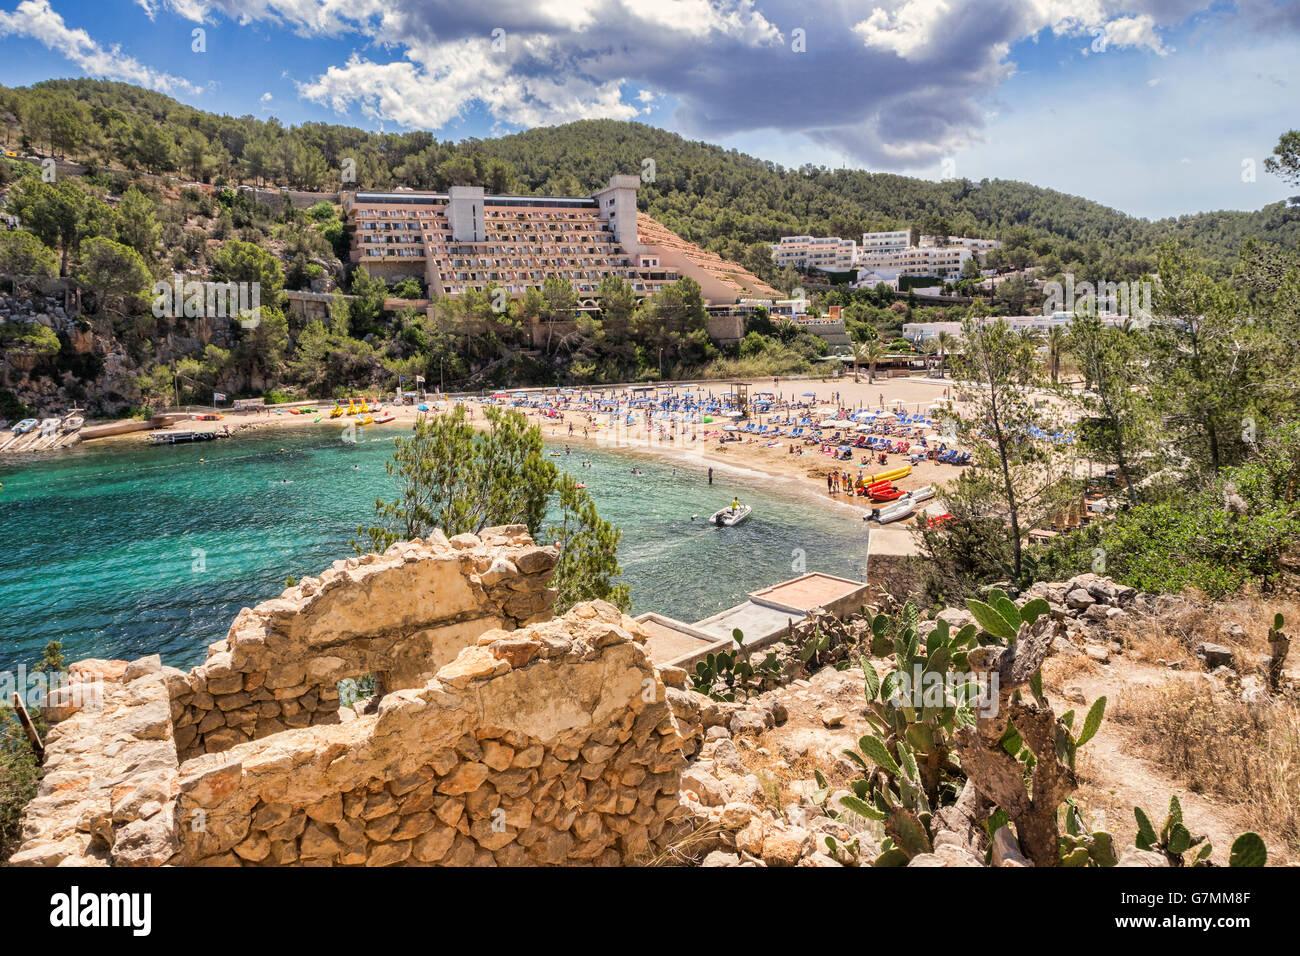 Puerto de San Miguel, Ibiza, Spanien. Stockbild